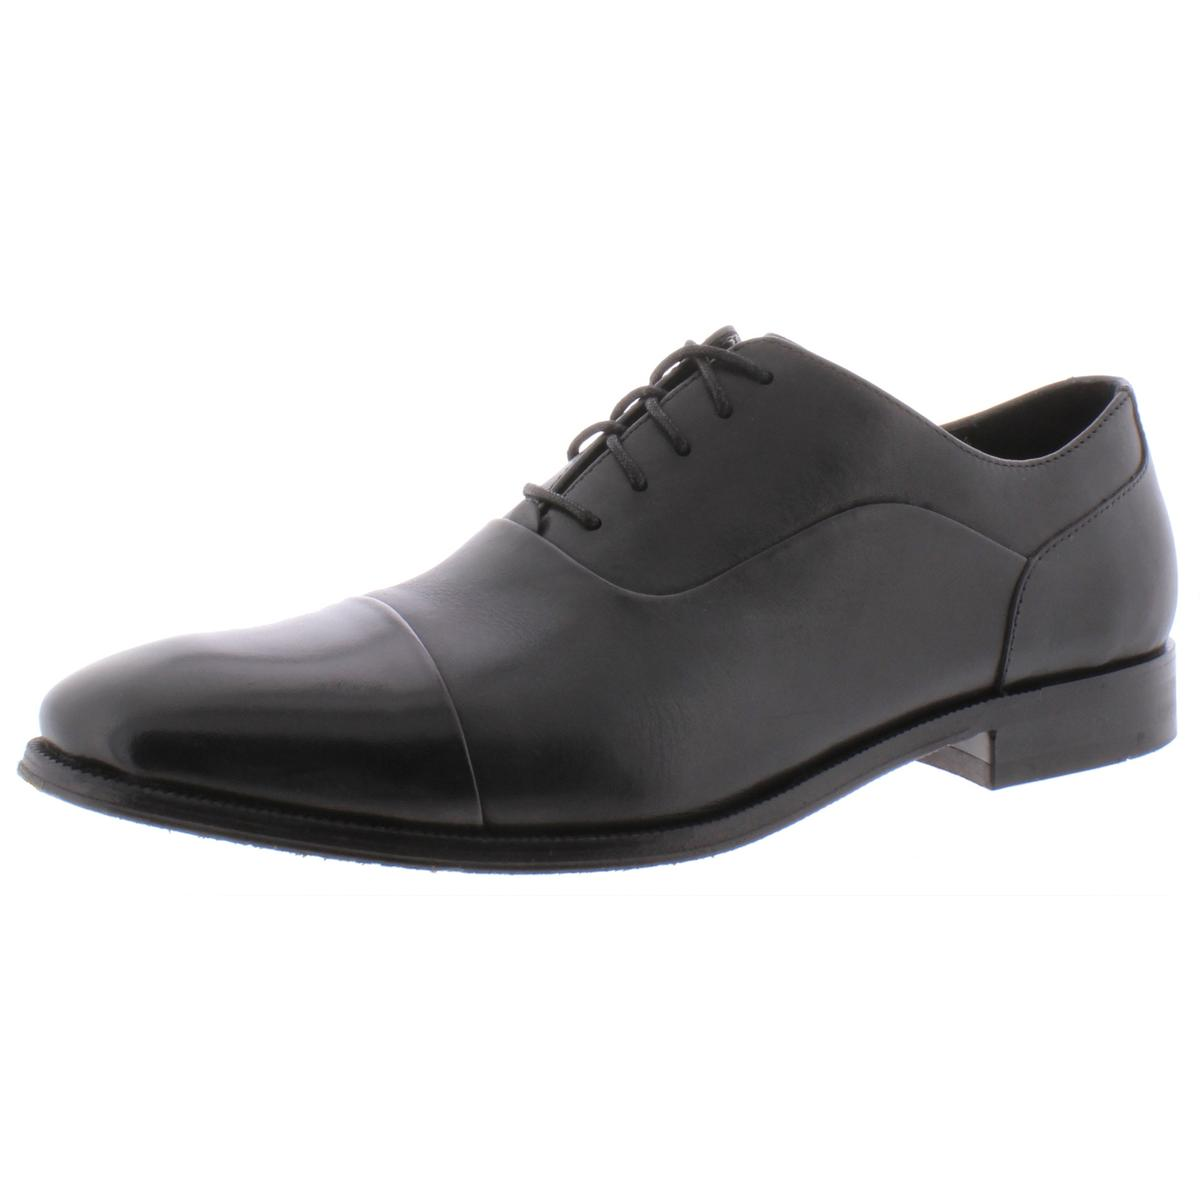 The Men/'s Store Mens Leather Cap Toe Dress Oxfords Shoes BHFO 9130